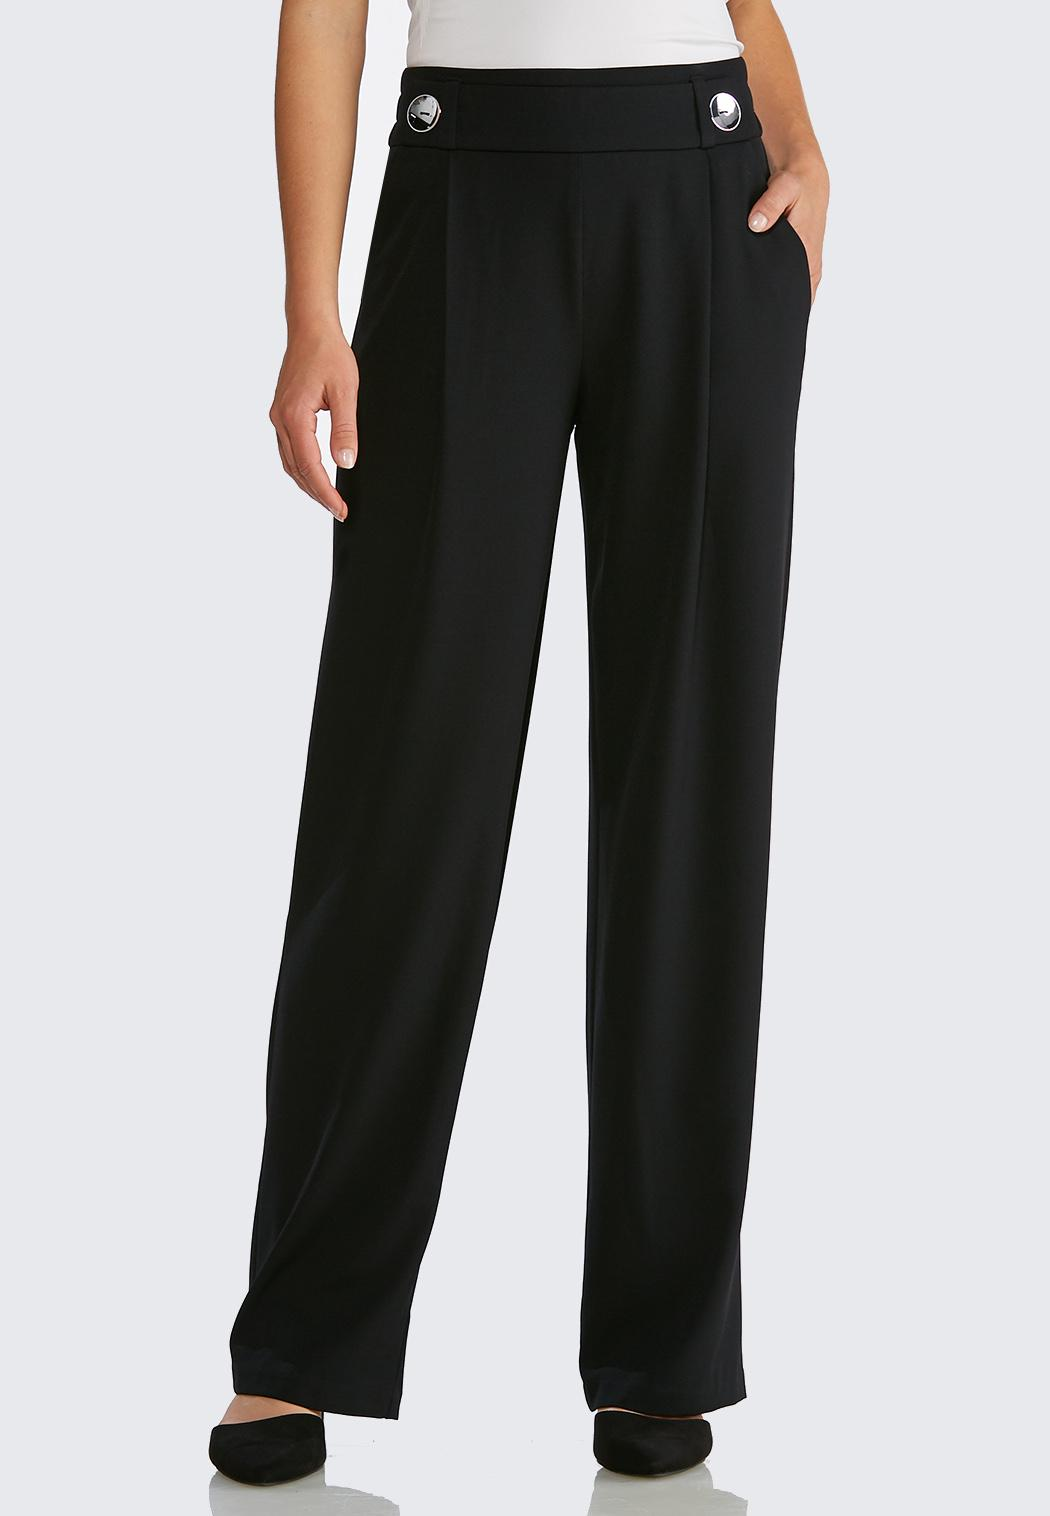 ed0ef7c9fb1 Button Front Trouser Pants Wide Leg Cato Fashions